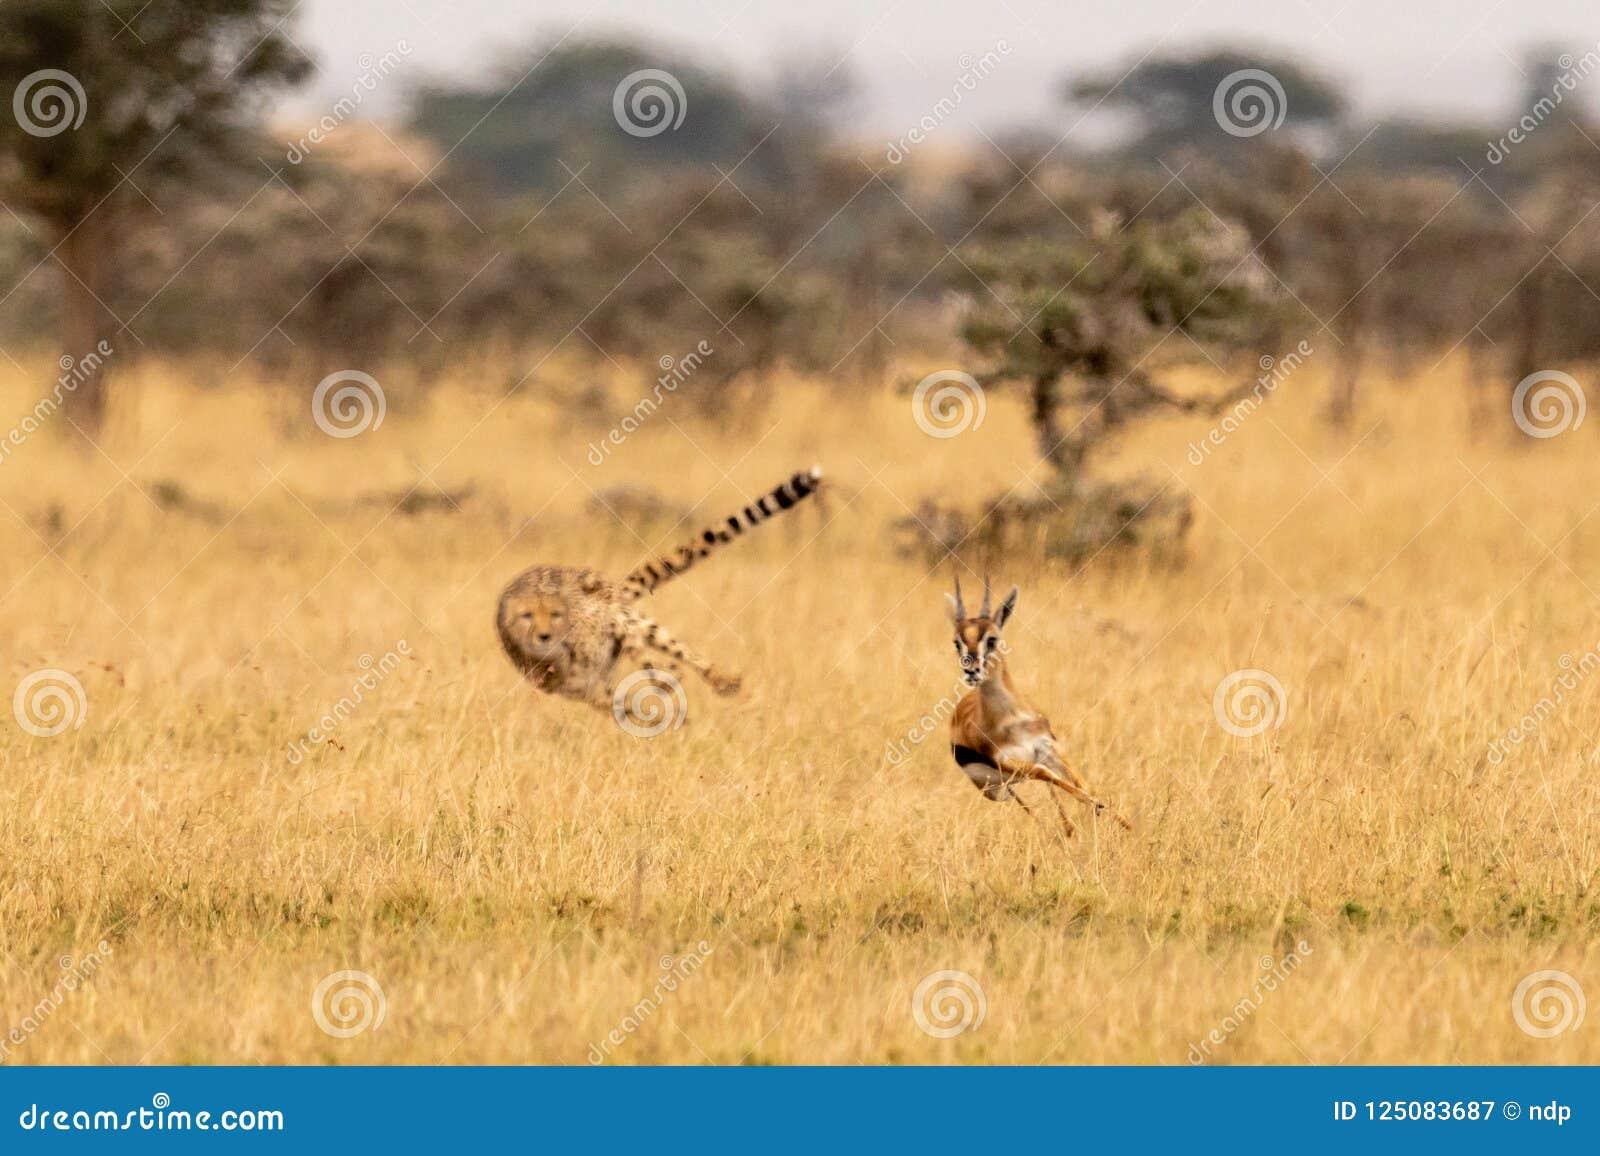 Гепард гоня газеля Томсона среди свистя терниев